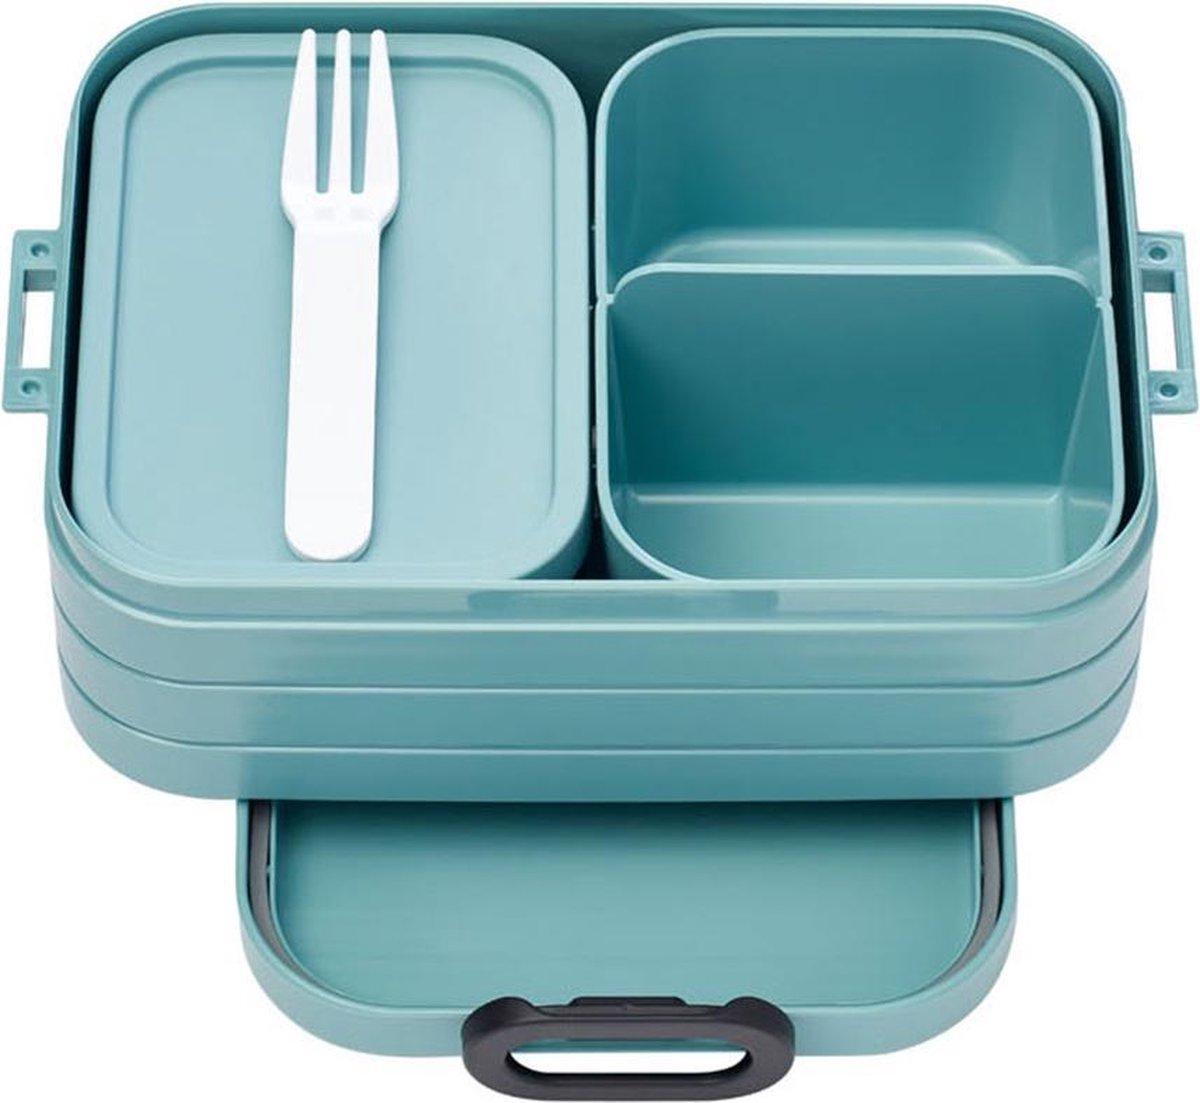 Mepal Bento Lunchbox Take a Break Midi - Nordic Green